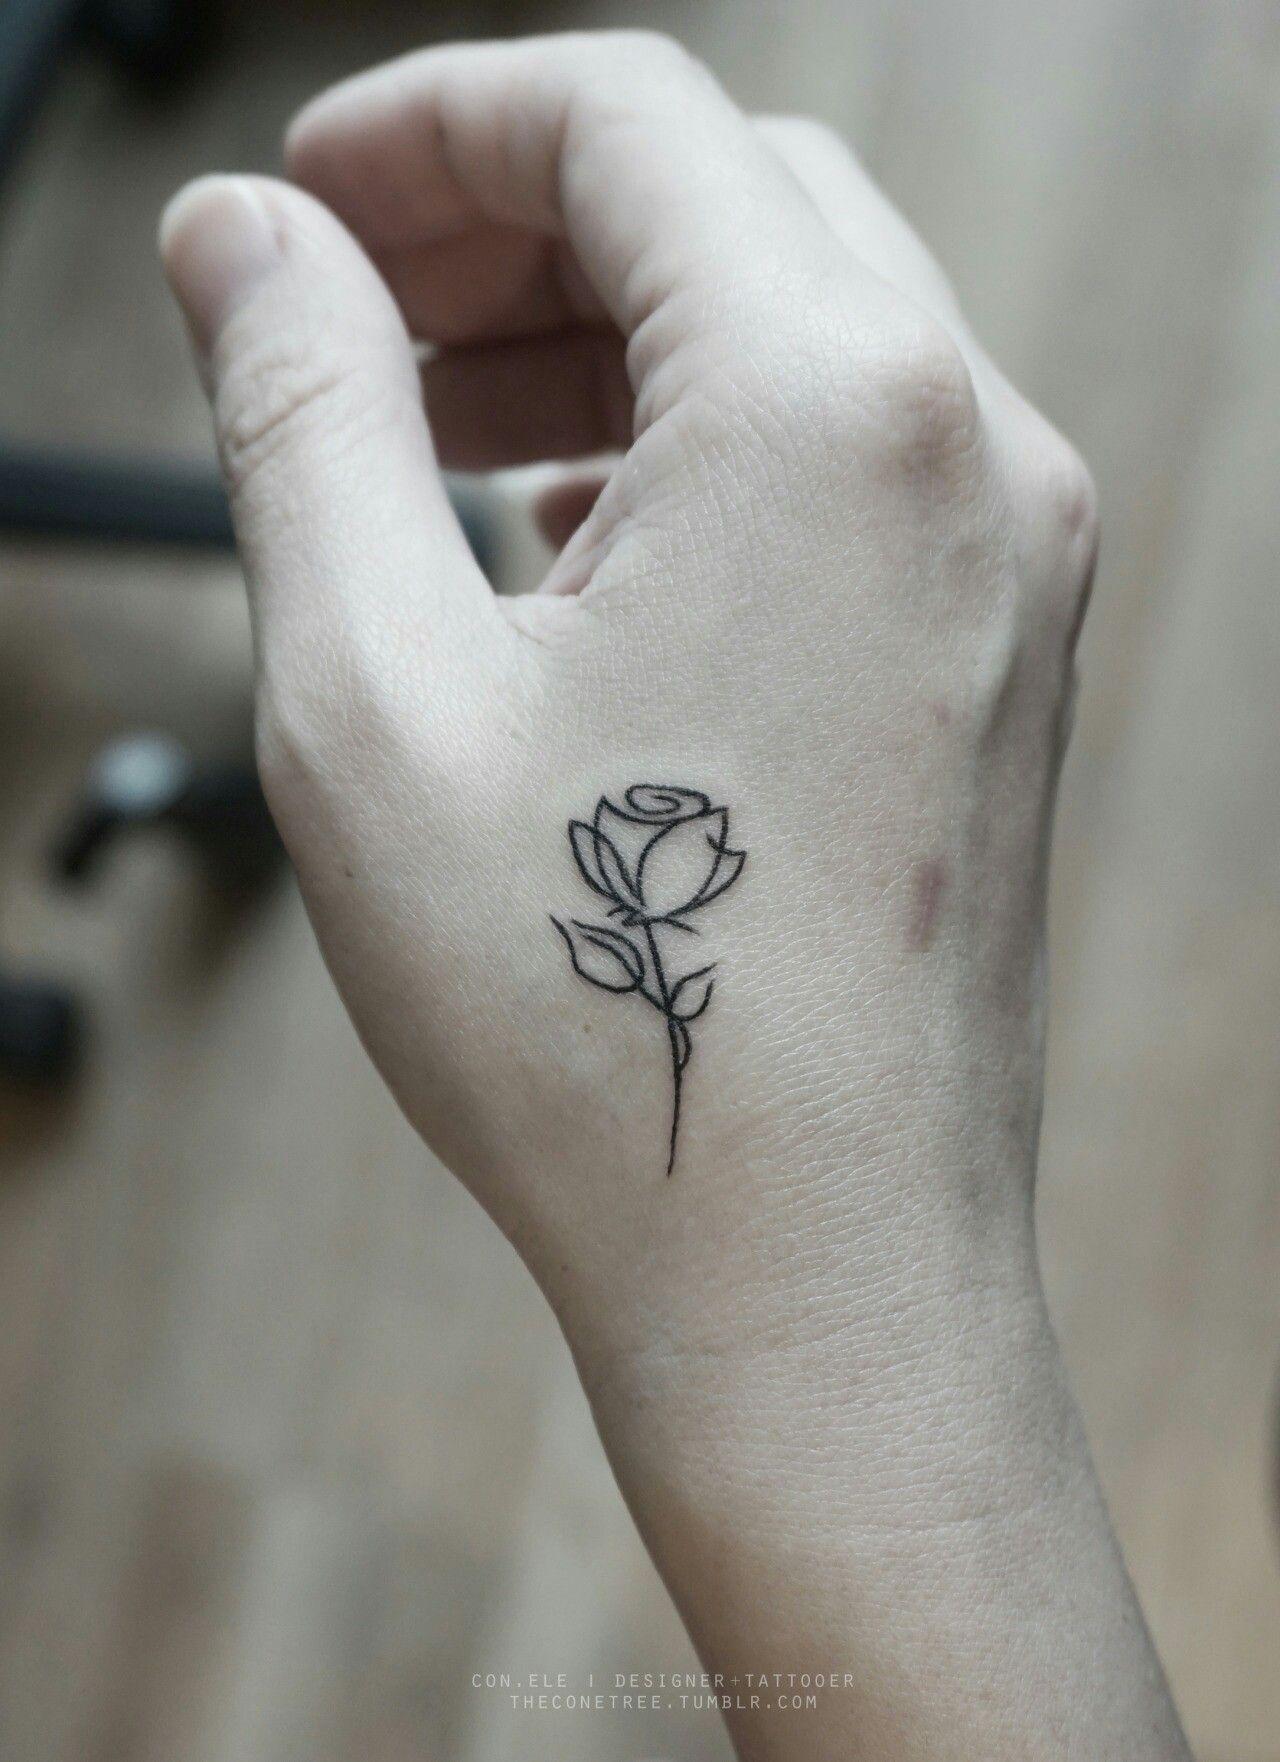 Japanese tattoos feb 27 frog tattoo on foot feb 25 japanese tattoo - Nice Tattoos Small Disney Tattoosdisney Foot Tattoofemale